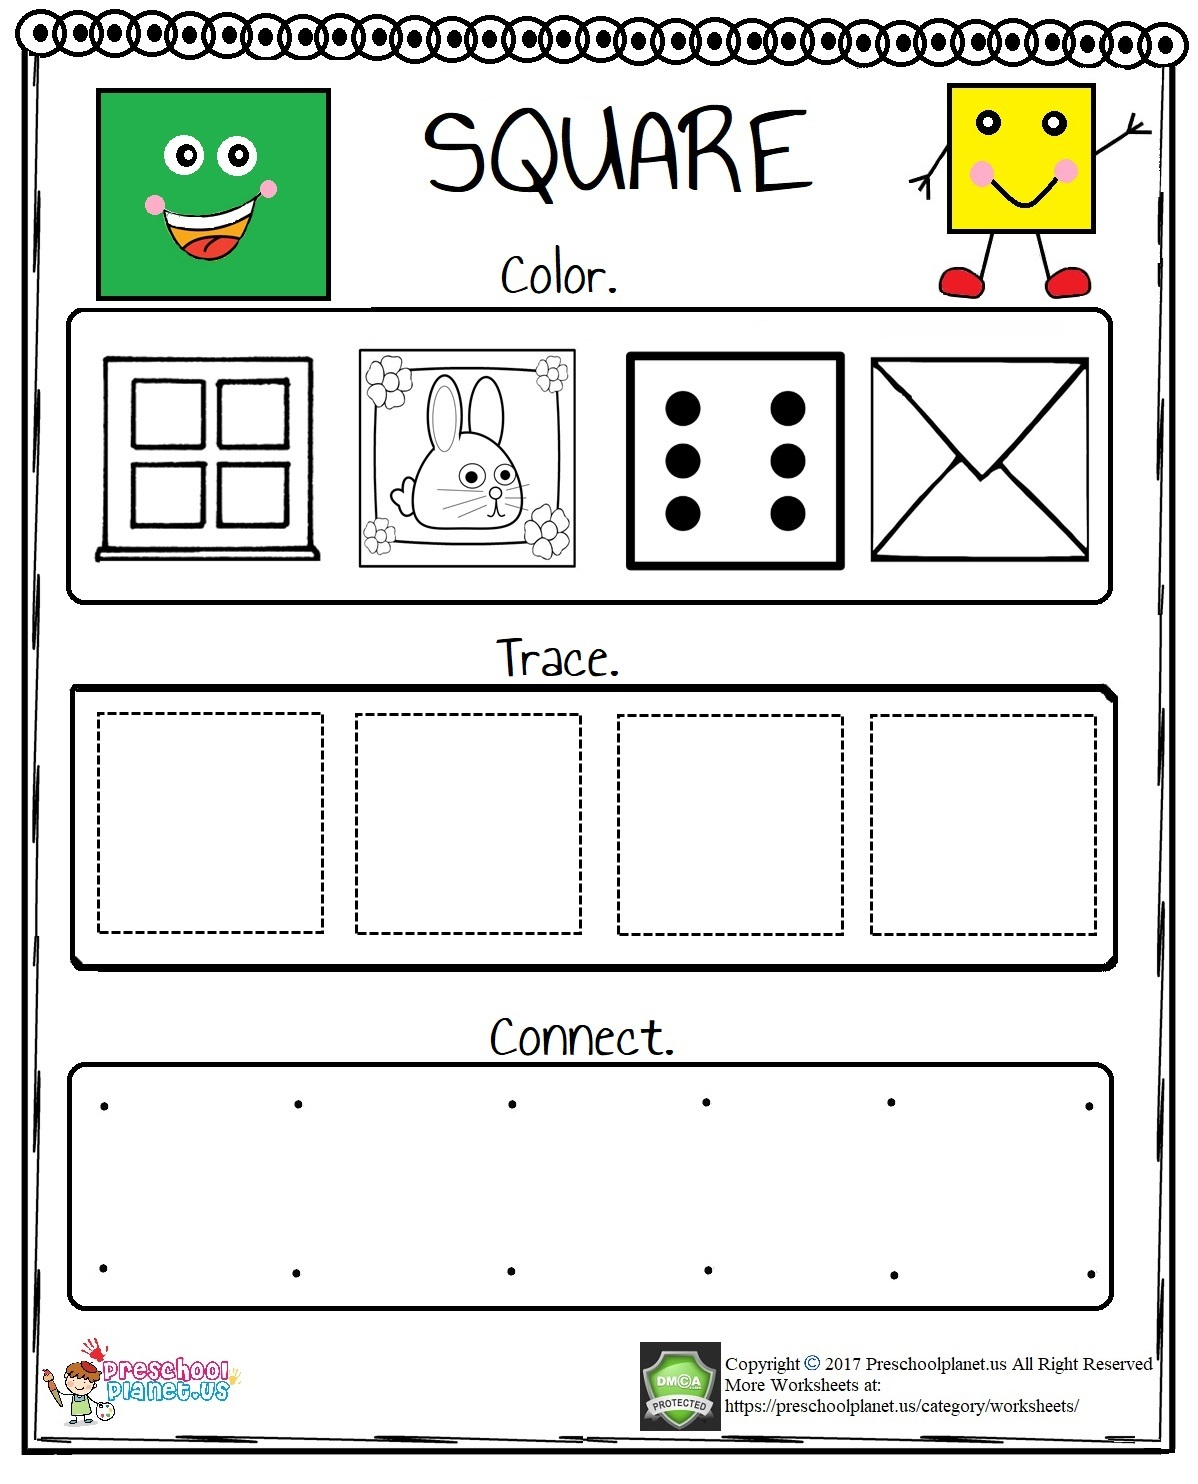 Leprechaun Craft Idea For Kids Preschoolplanet